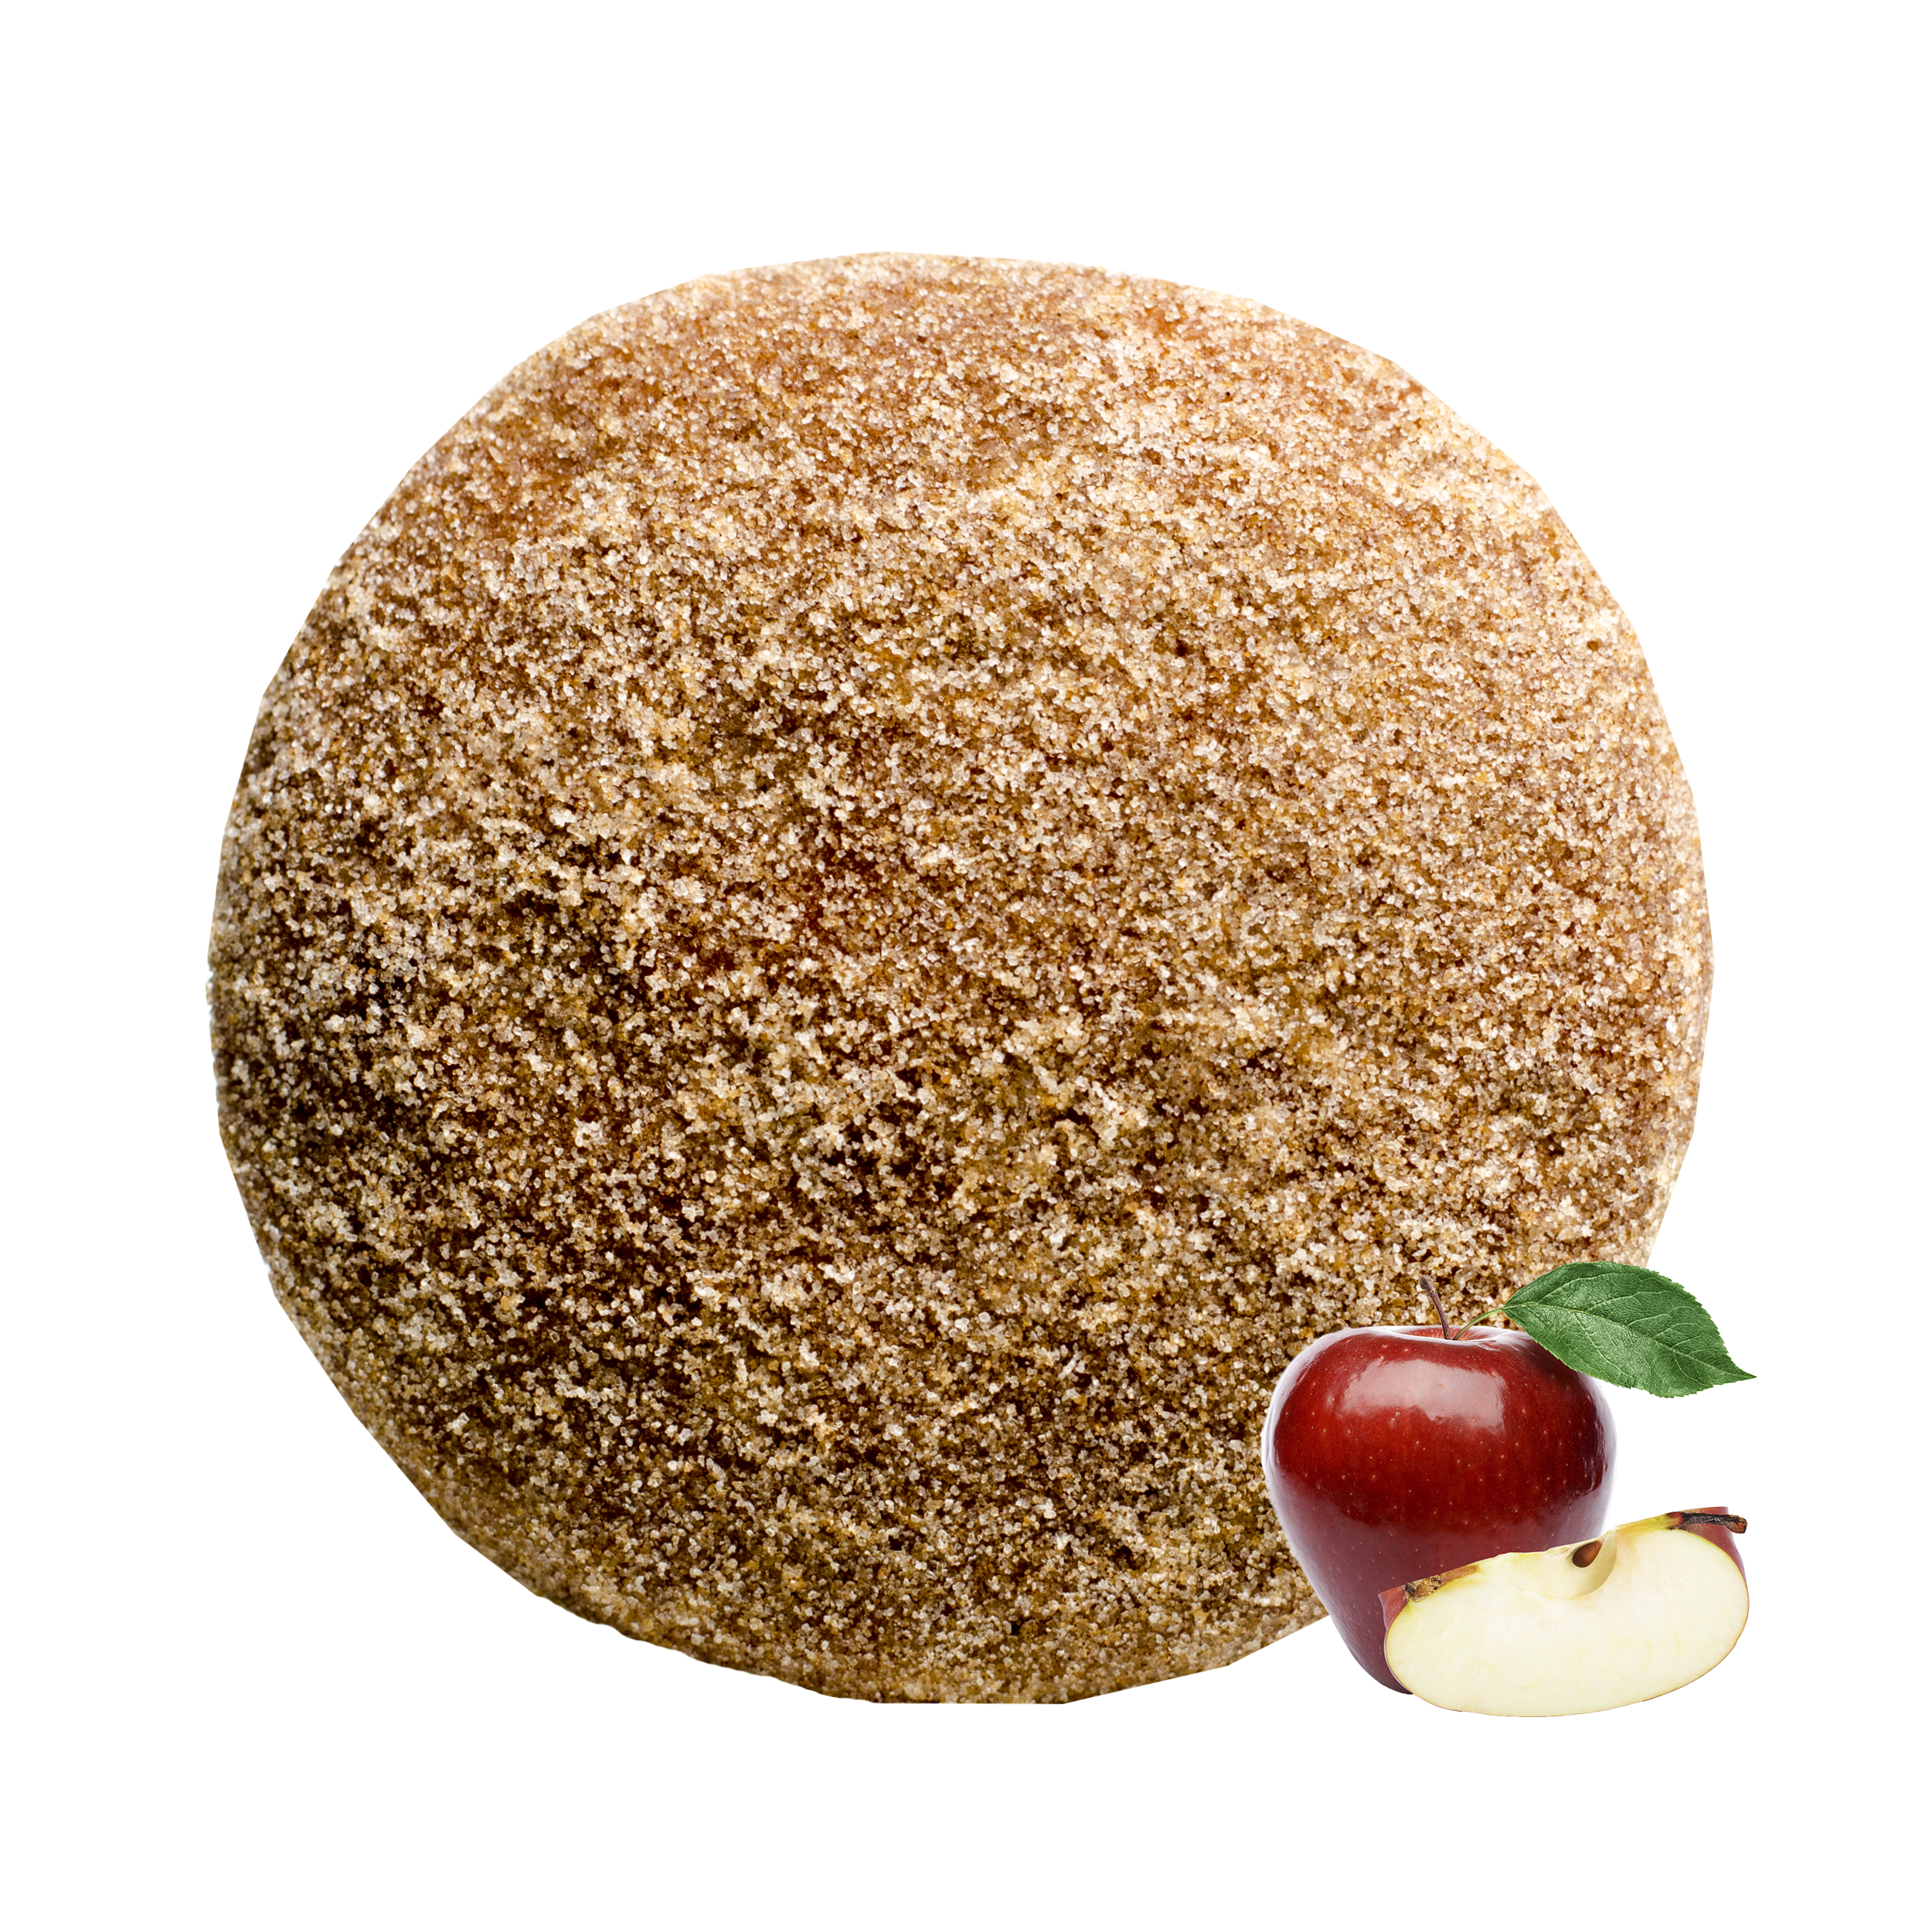 cinnamon-apple.png